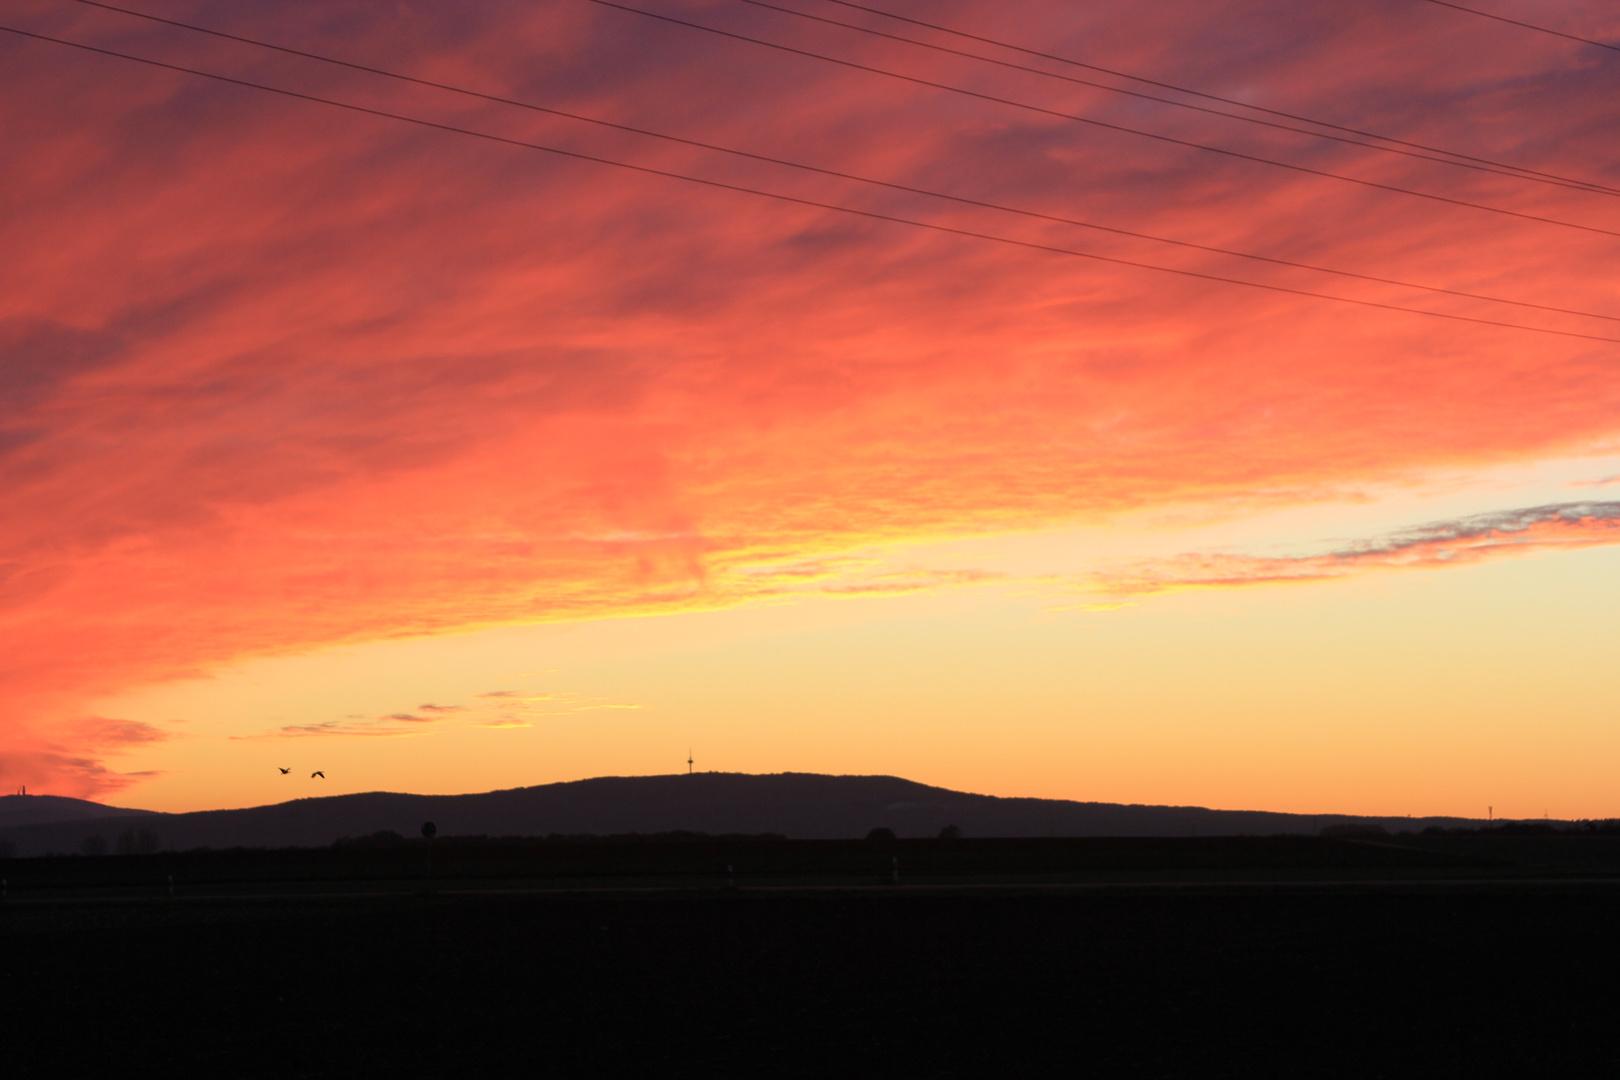 Sonnenuntergang in der Wetterau. Blick Richtung Taunus.